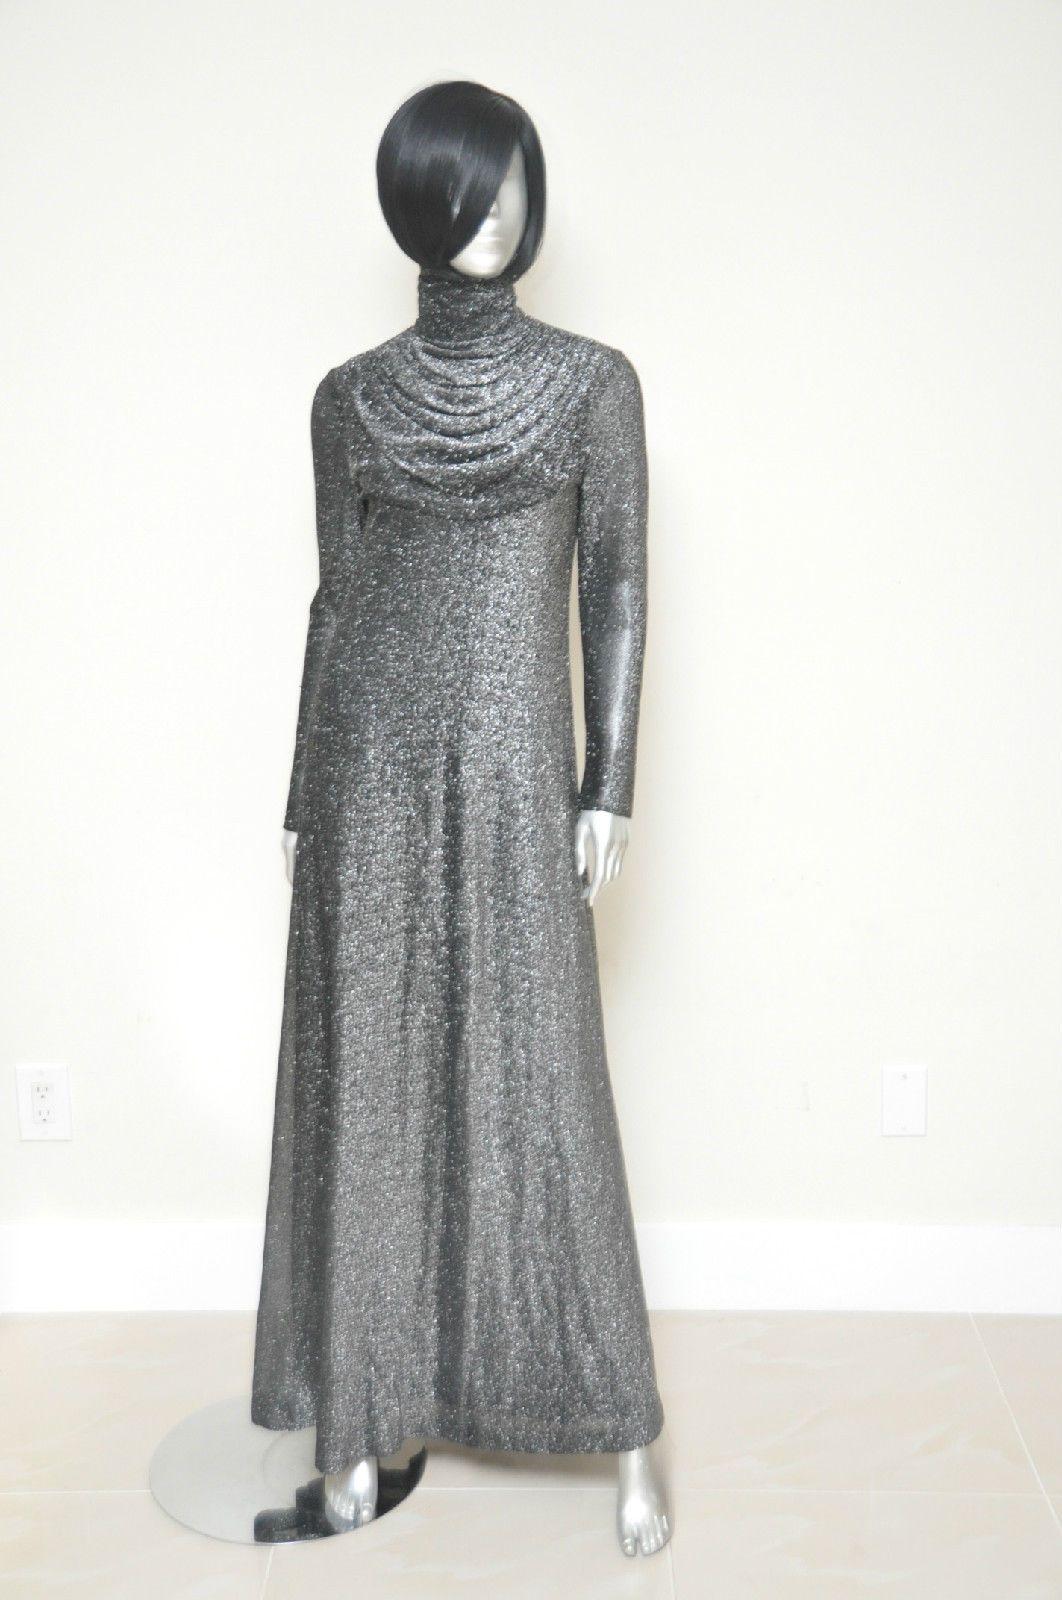 Vintage Saks Fifth Avenue Full Length Dress Evening Gown S/M Black ...